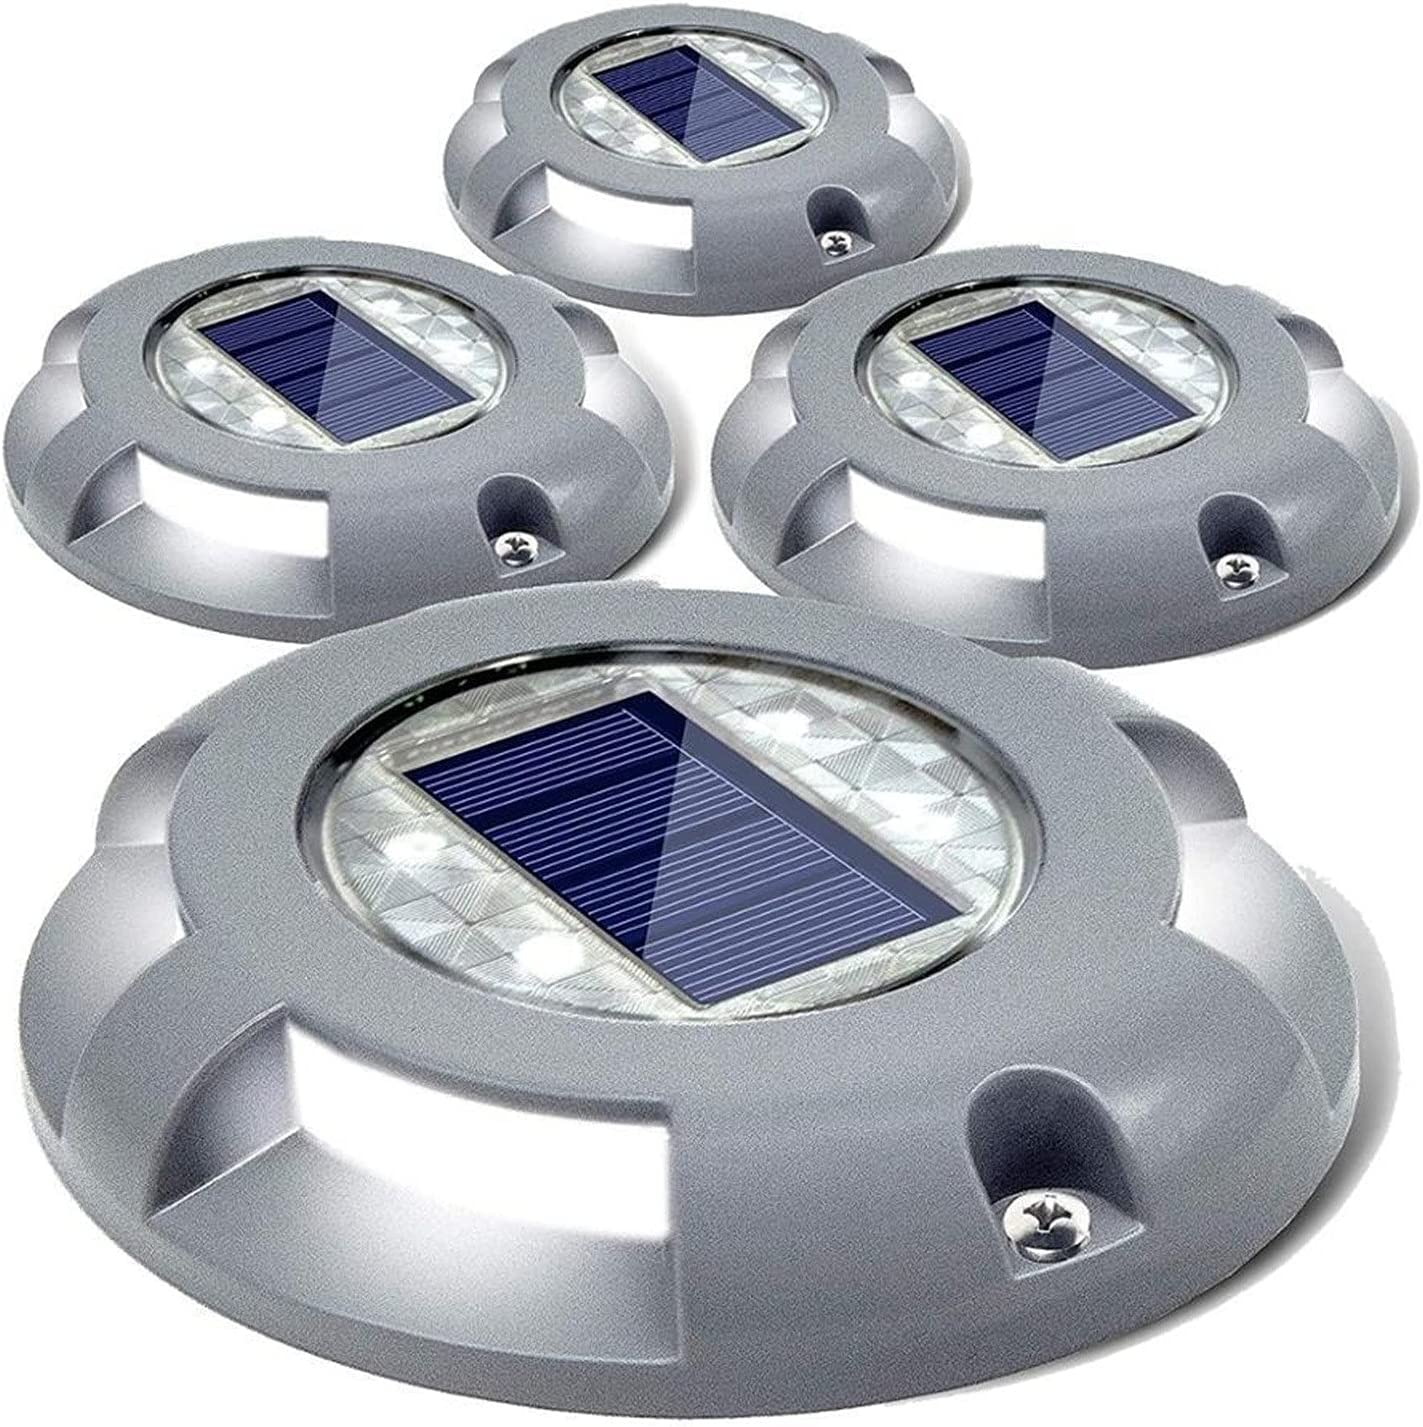 ZHAHAPPY Solar Deck Lights - Driveway Light Power Dock LED Alternative dealer OFFicial mail order